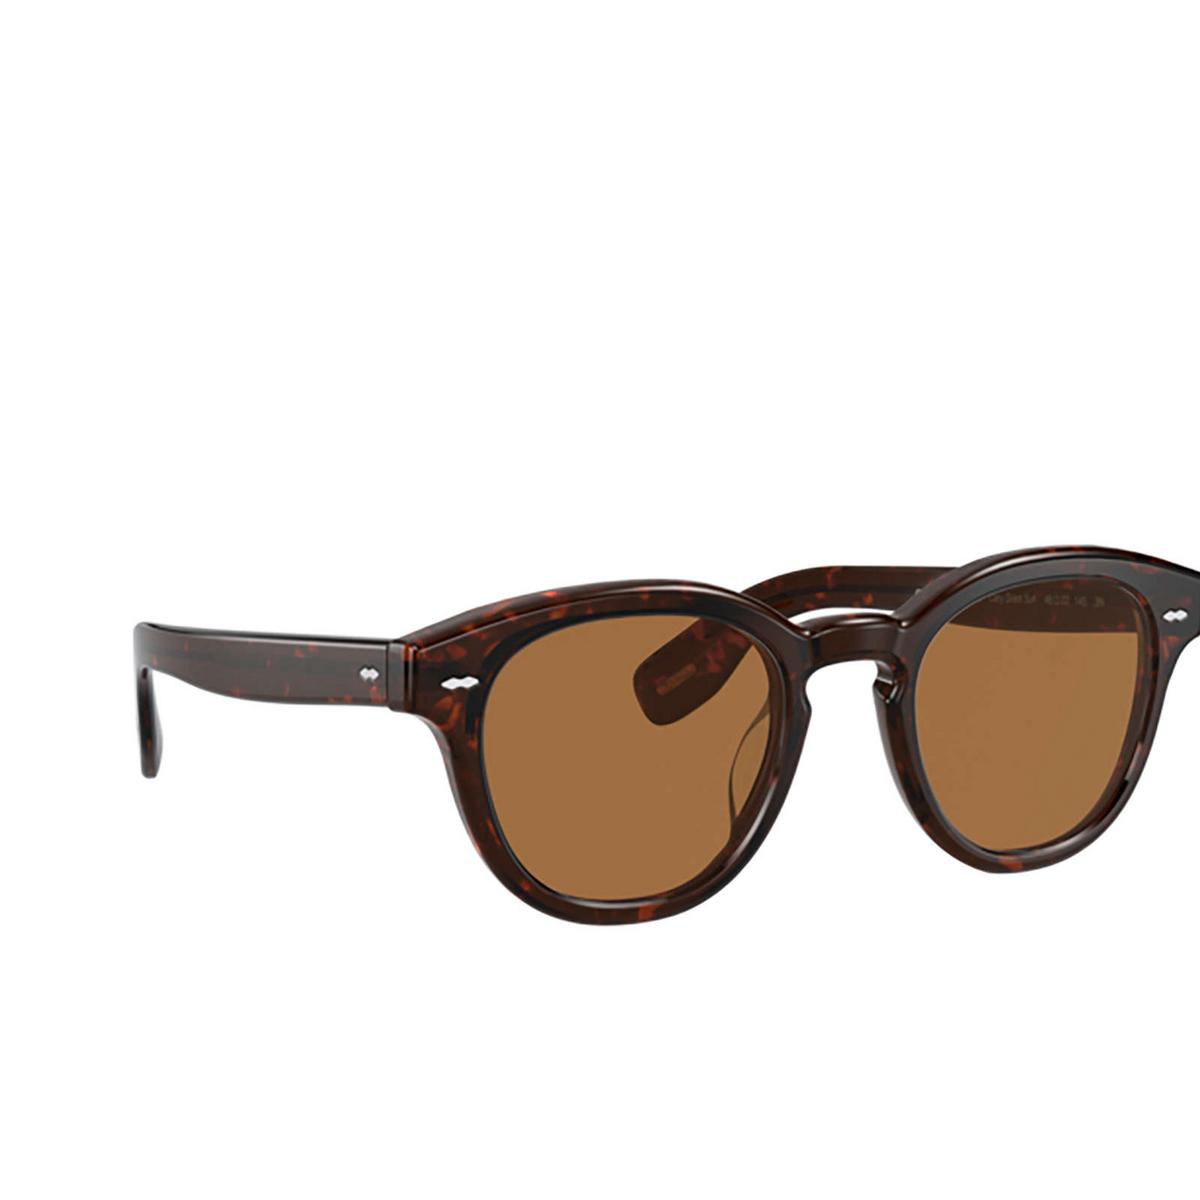 Oliver Peoples® Round Sunglasses: Cary Grant Sun OV5413SU color Dm2 165453.